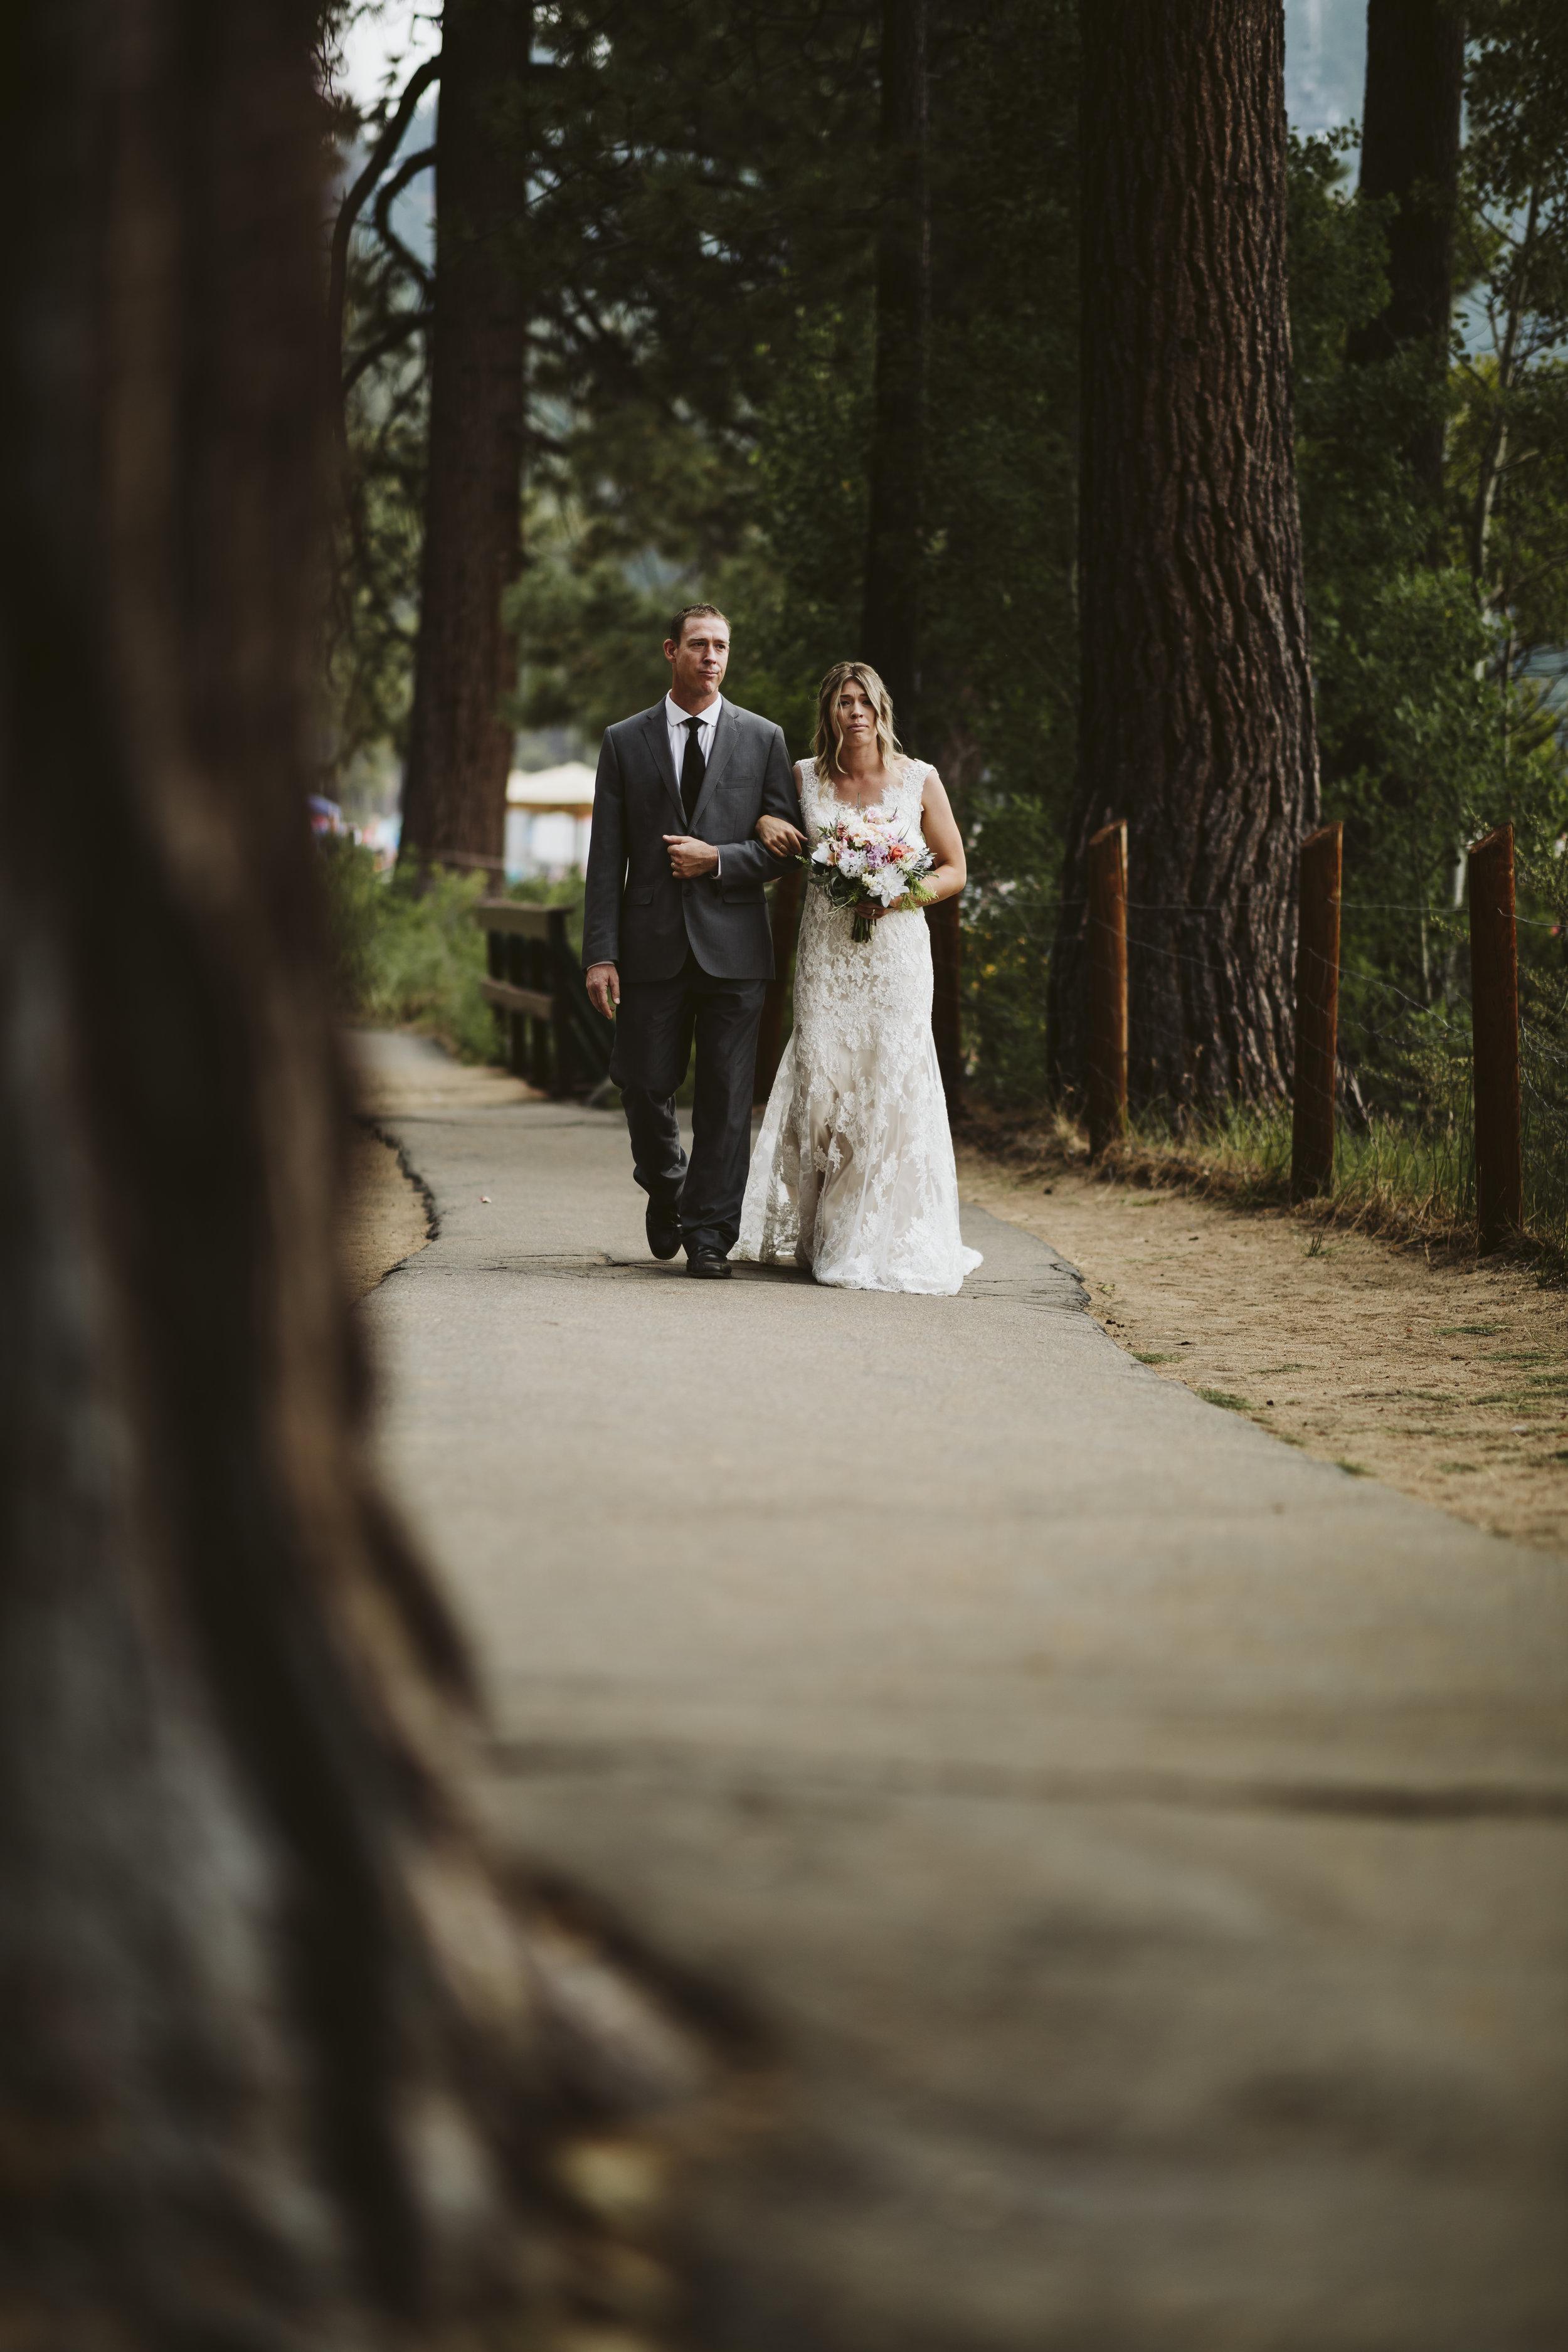 _P8A4179vild-vild photography-photography-wedding-wedding photography-tahoe-lake tahoe-lake tahoe wedding photographer-nevada wedding photographer-mountain wedding.jpg